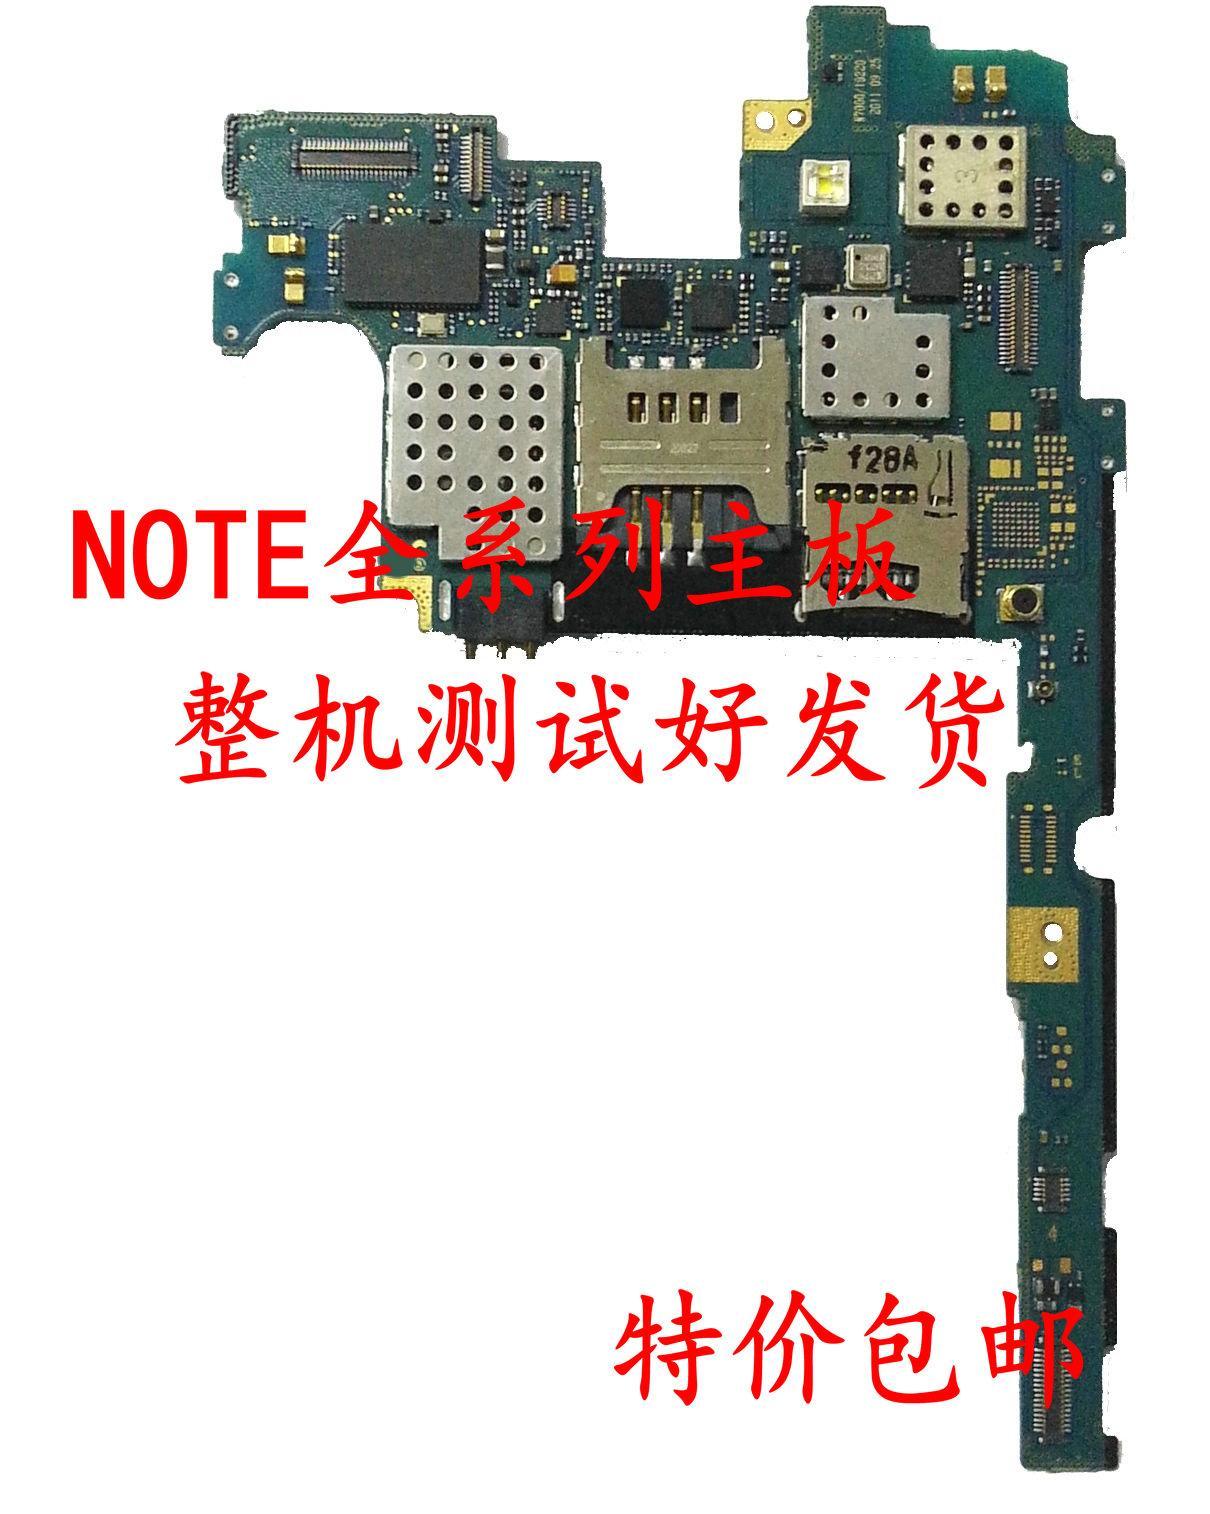 Cek Harga Baru Venomrx H61 Motherboard Intel Chipset Terkini Situs Ddr3 Lga 1155 Note I889i9228i9220i717 N7000n7005e210e160k